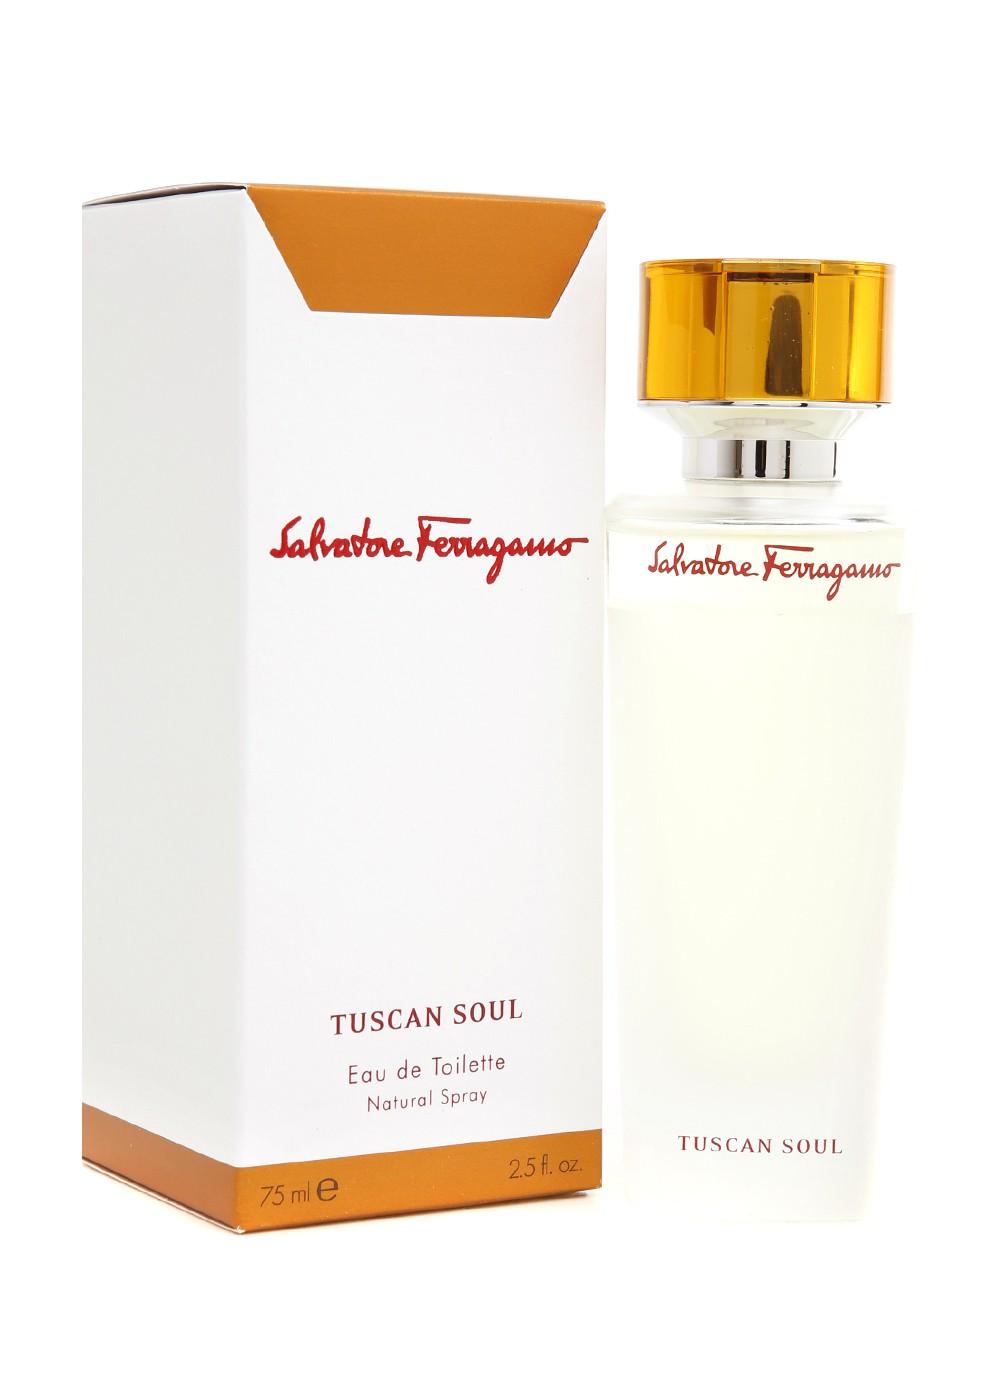 Salvatore Ferragamo Tuscan Soul аромат для мужчин и женщин